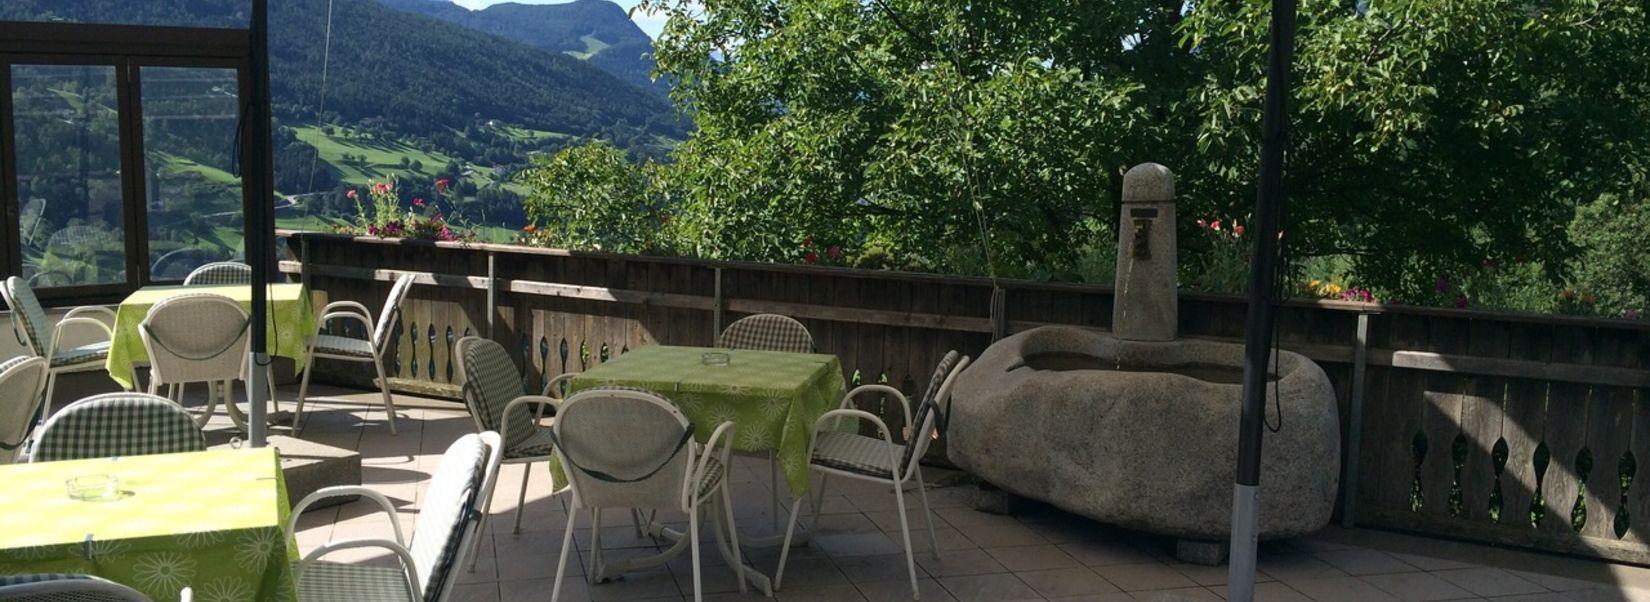 Albergo sturmhof villandro alto adige - Giardino d inverno terrazza ...